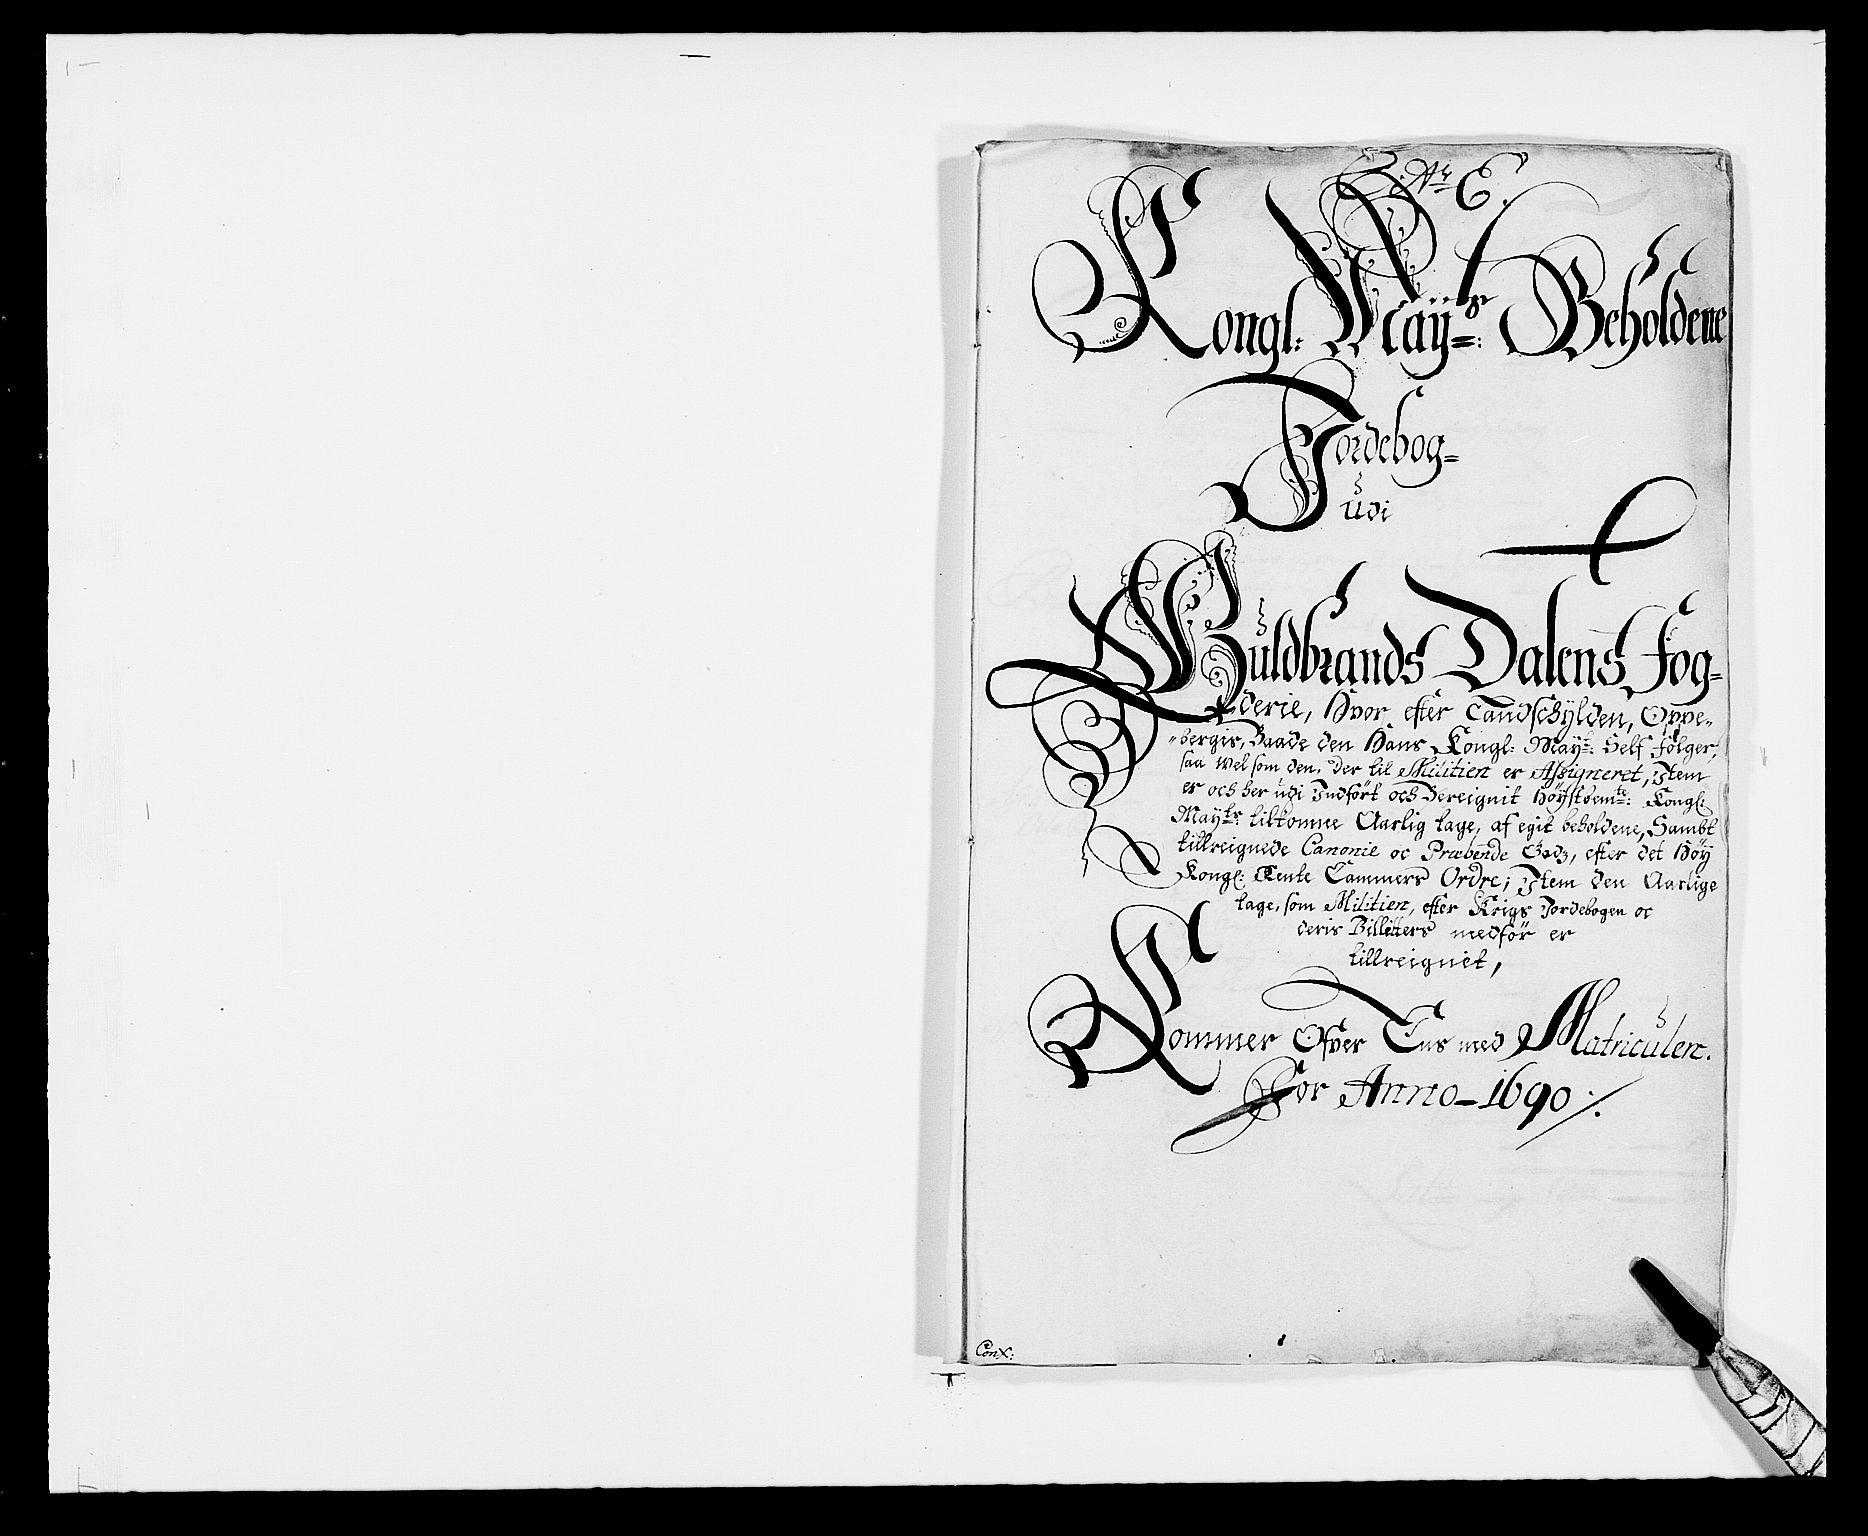 RA, Rentekammeret inntil 1814, Reviderte regnskaper, Fogderegnskap, R17/L1165: Fogderegnskap Gudbrandsdal, 1690-1692, s. 93